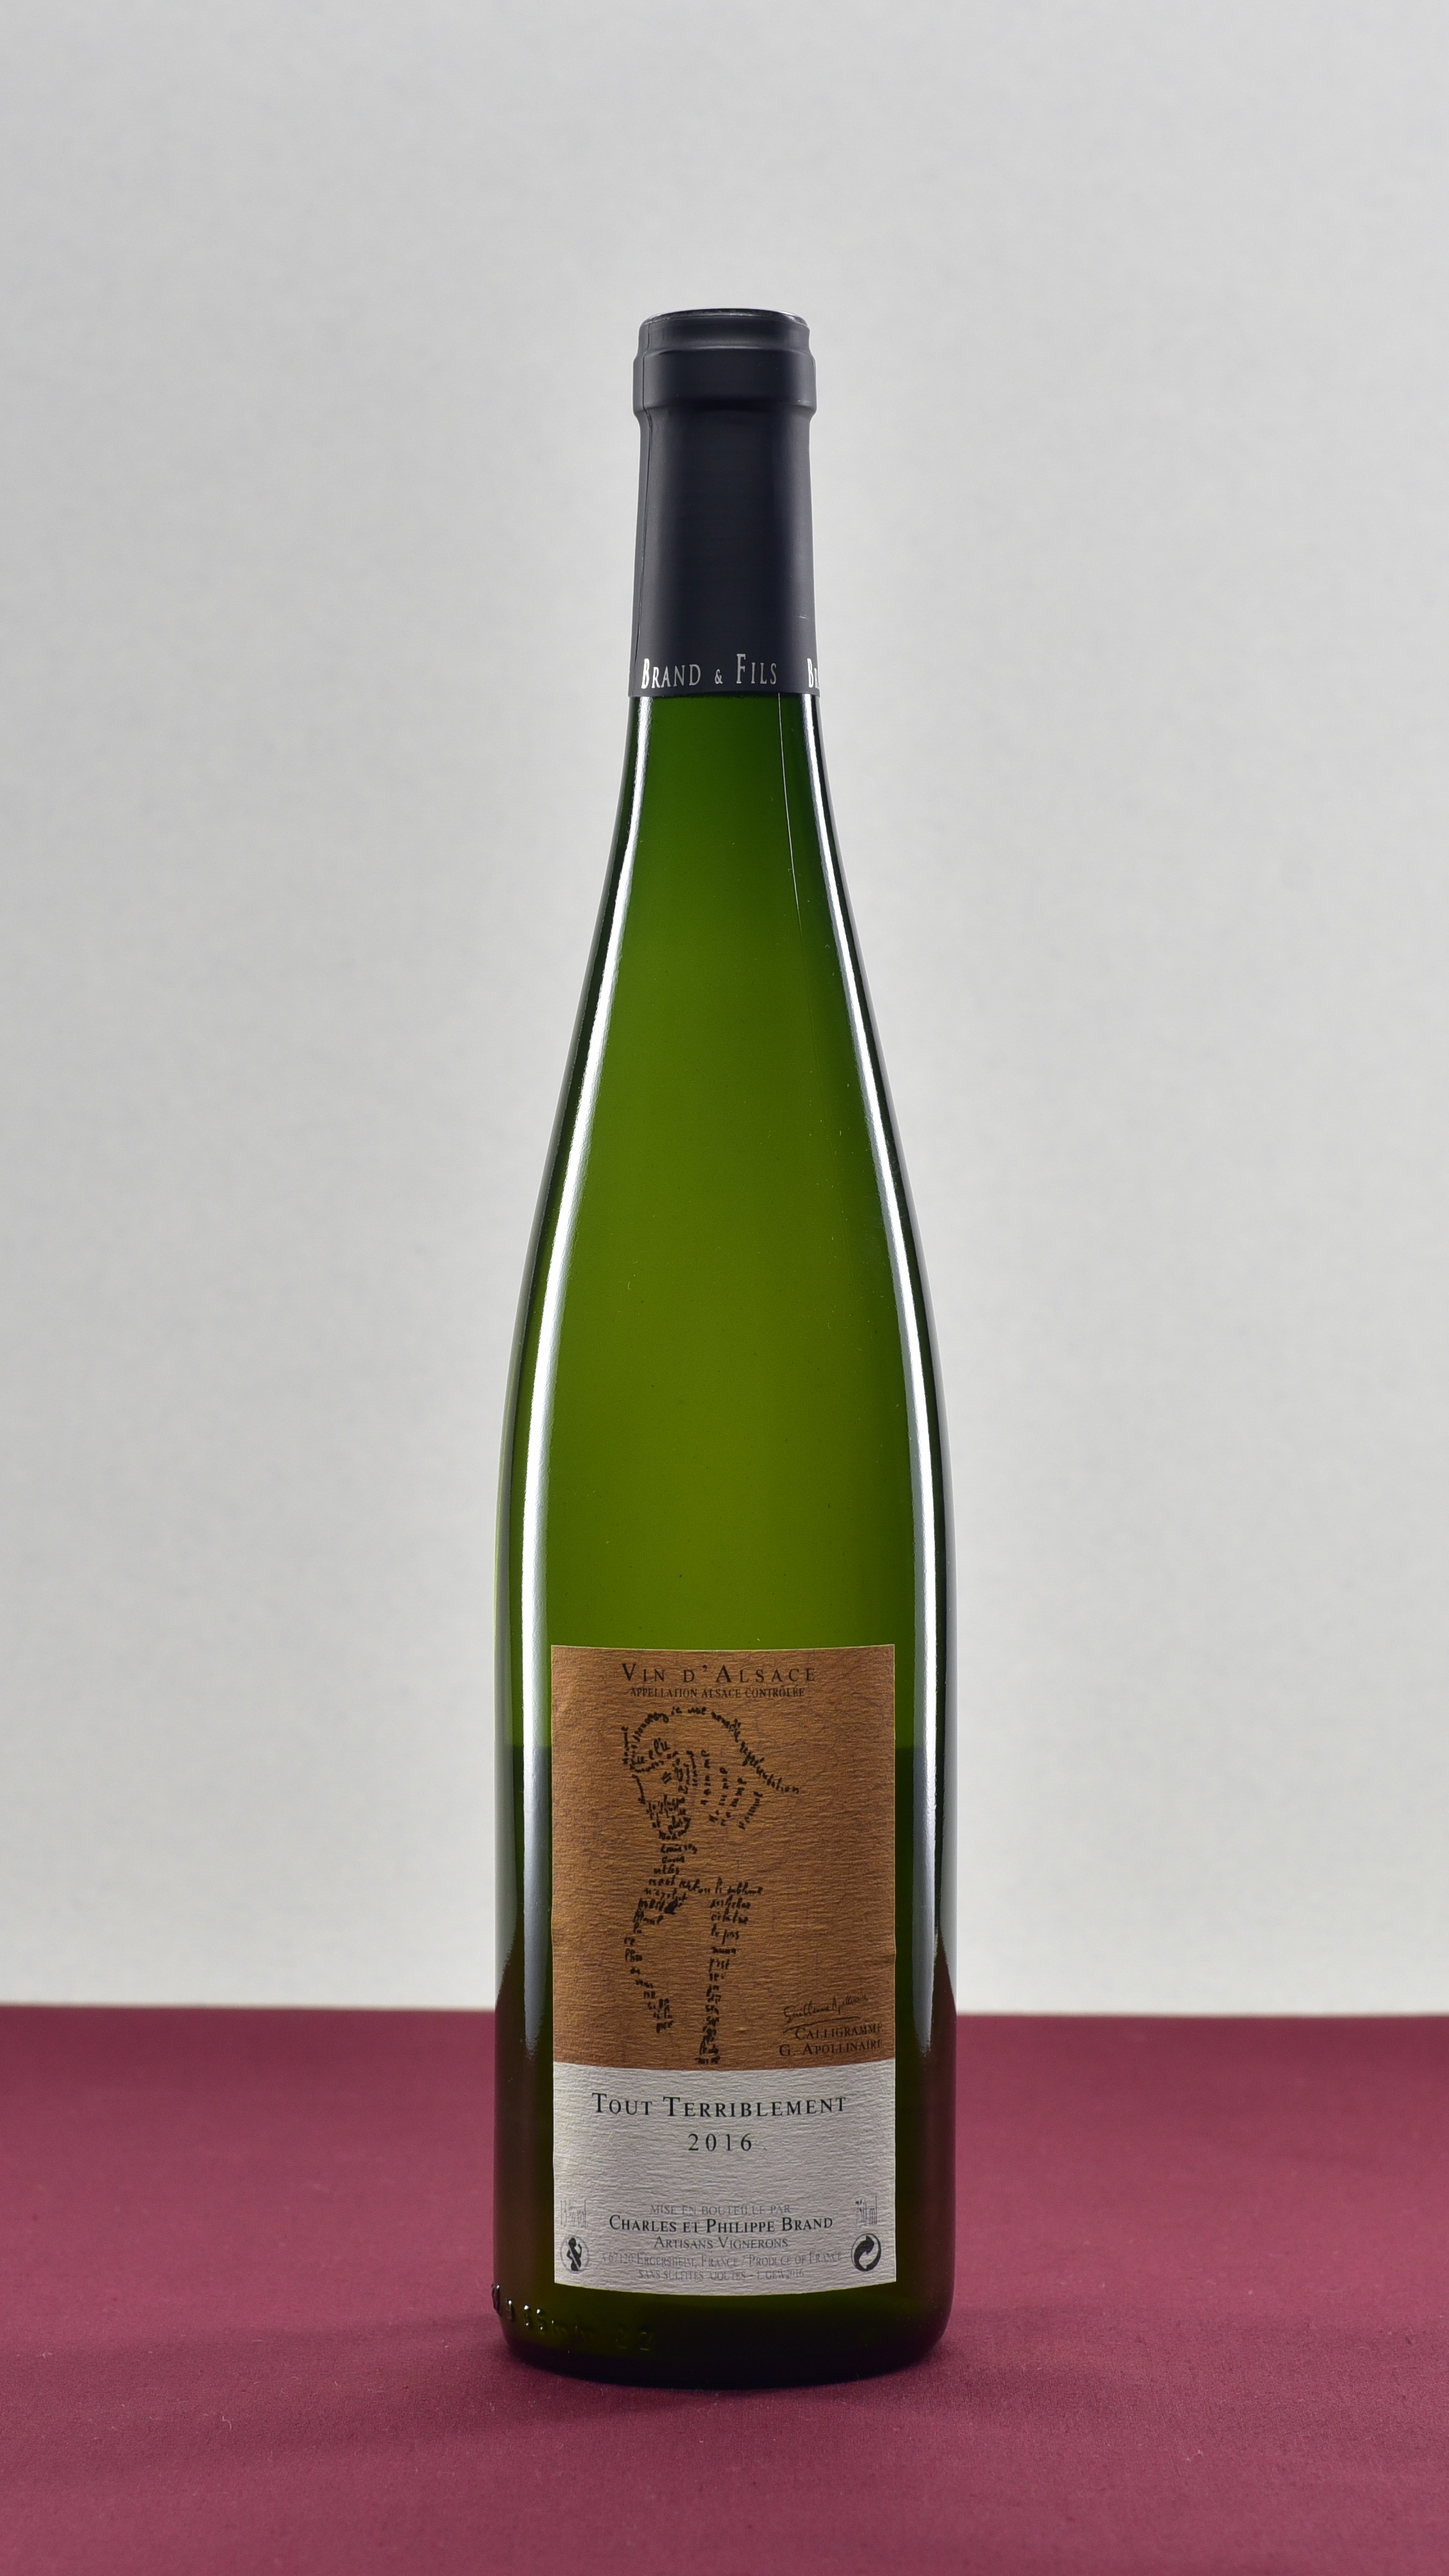 Tout Terriblement - Domaine Brand et Fils | Philippe BrandGewurztraminer Vin d'Alsace | 2016